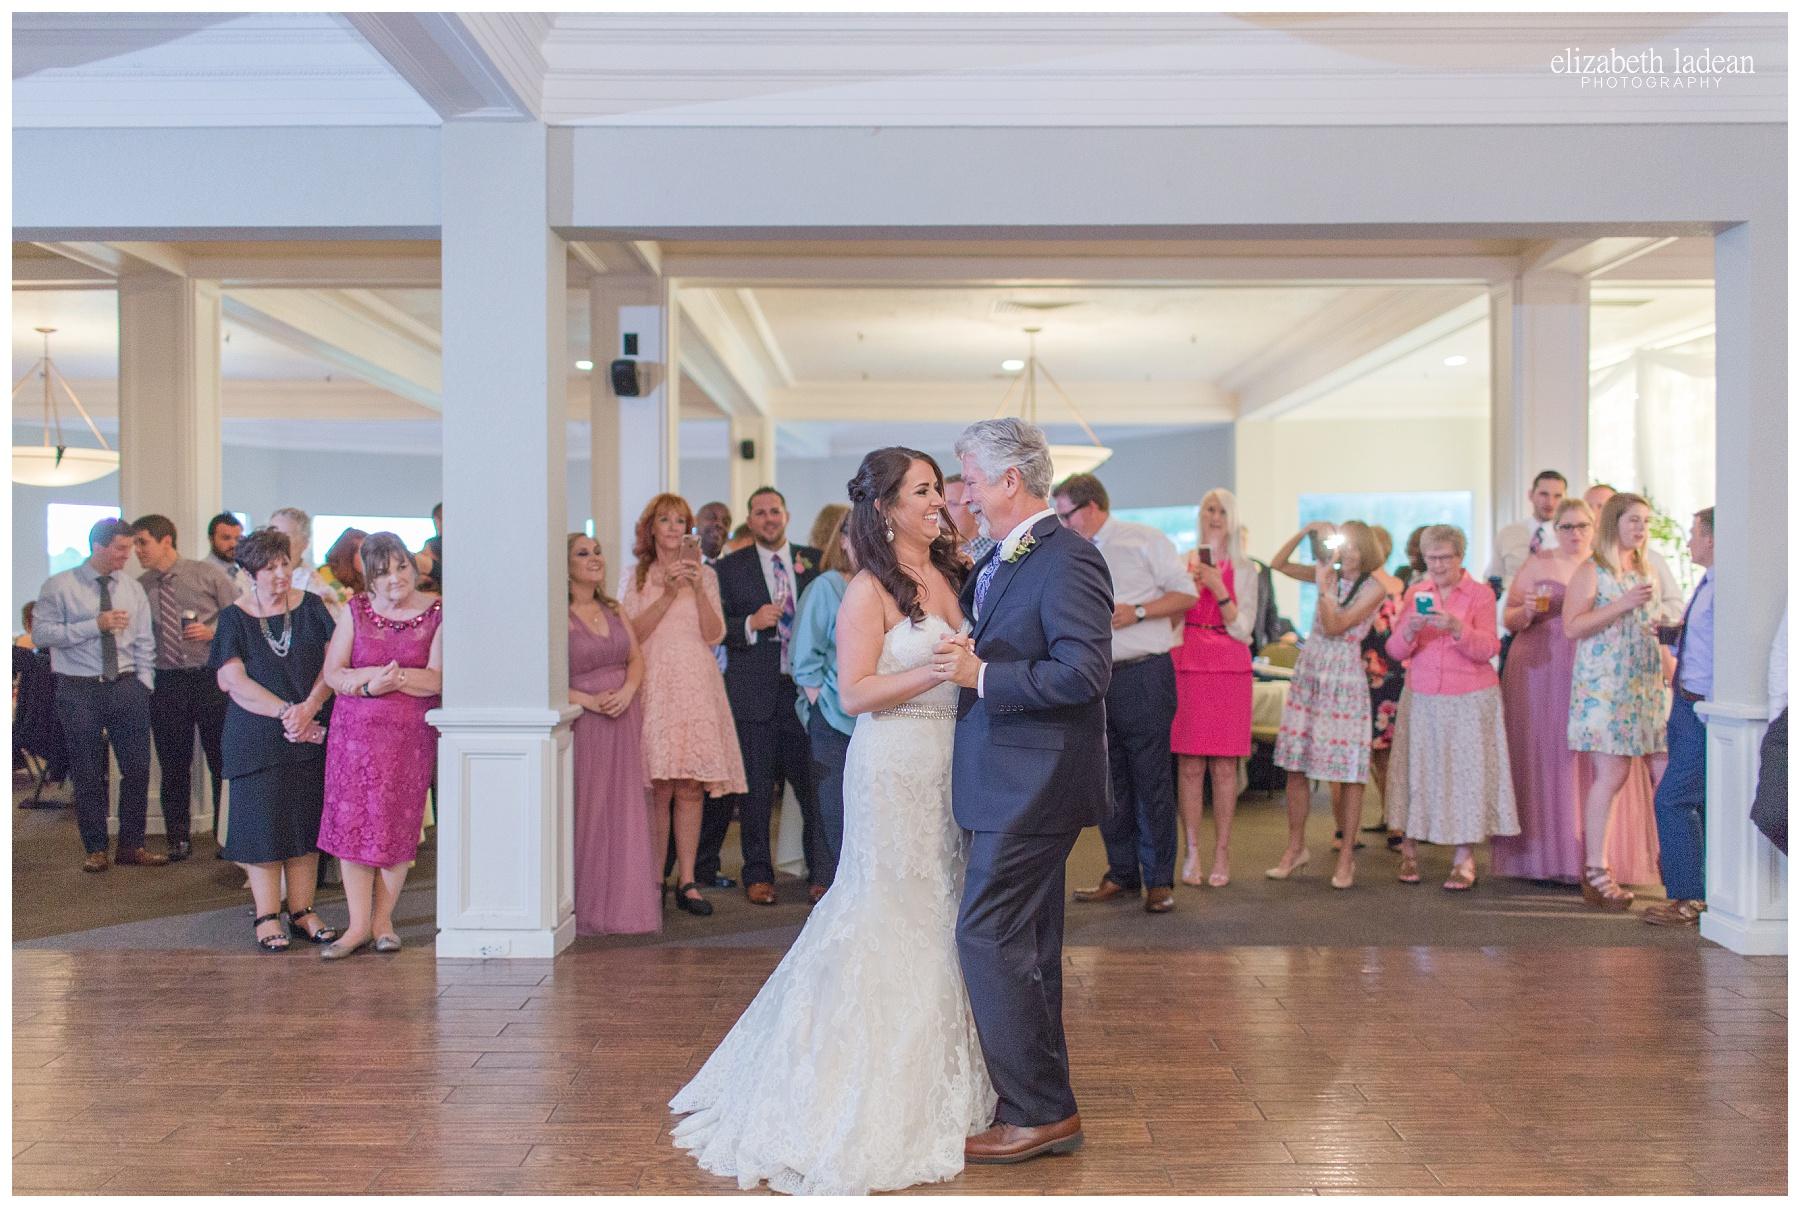 Hillcrest-Country-Club-Kansas-City-Wedding-Photography-E+J-0520-Elizabeth-Ladean-Photography-photo_0885.jpg